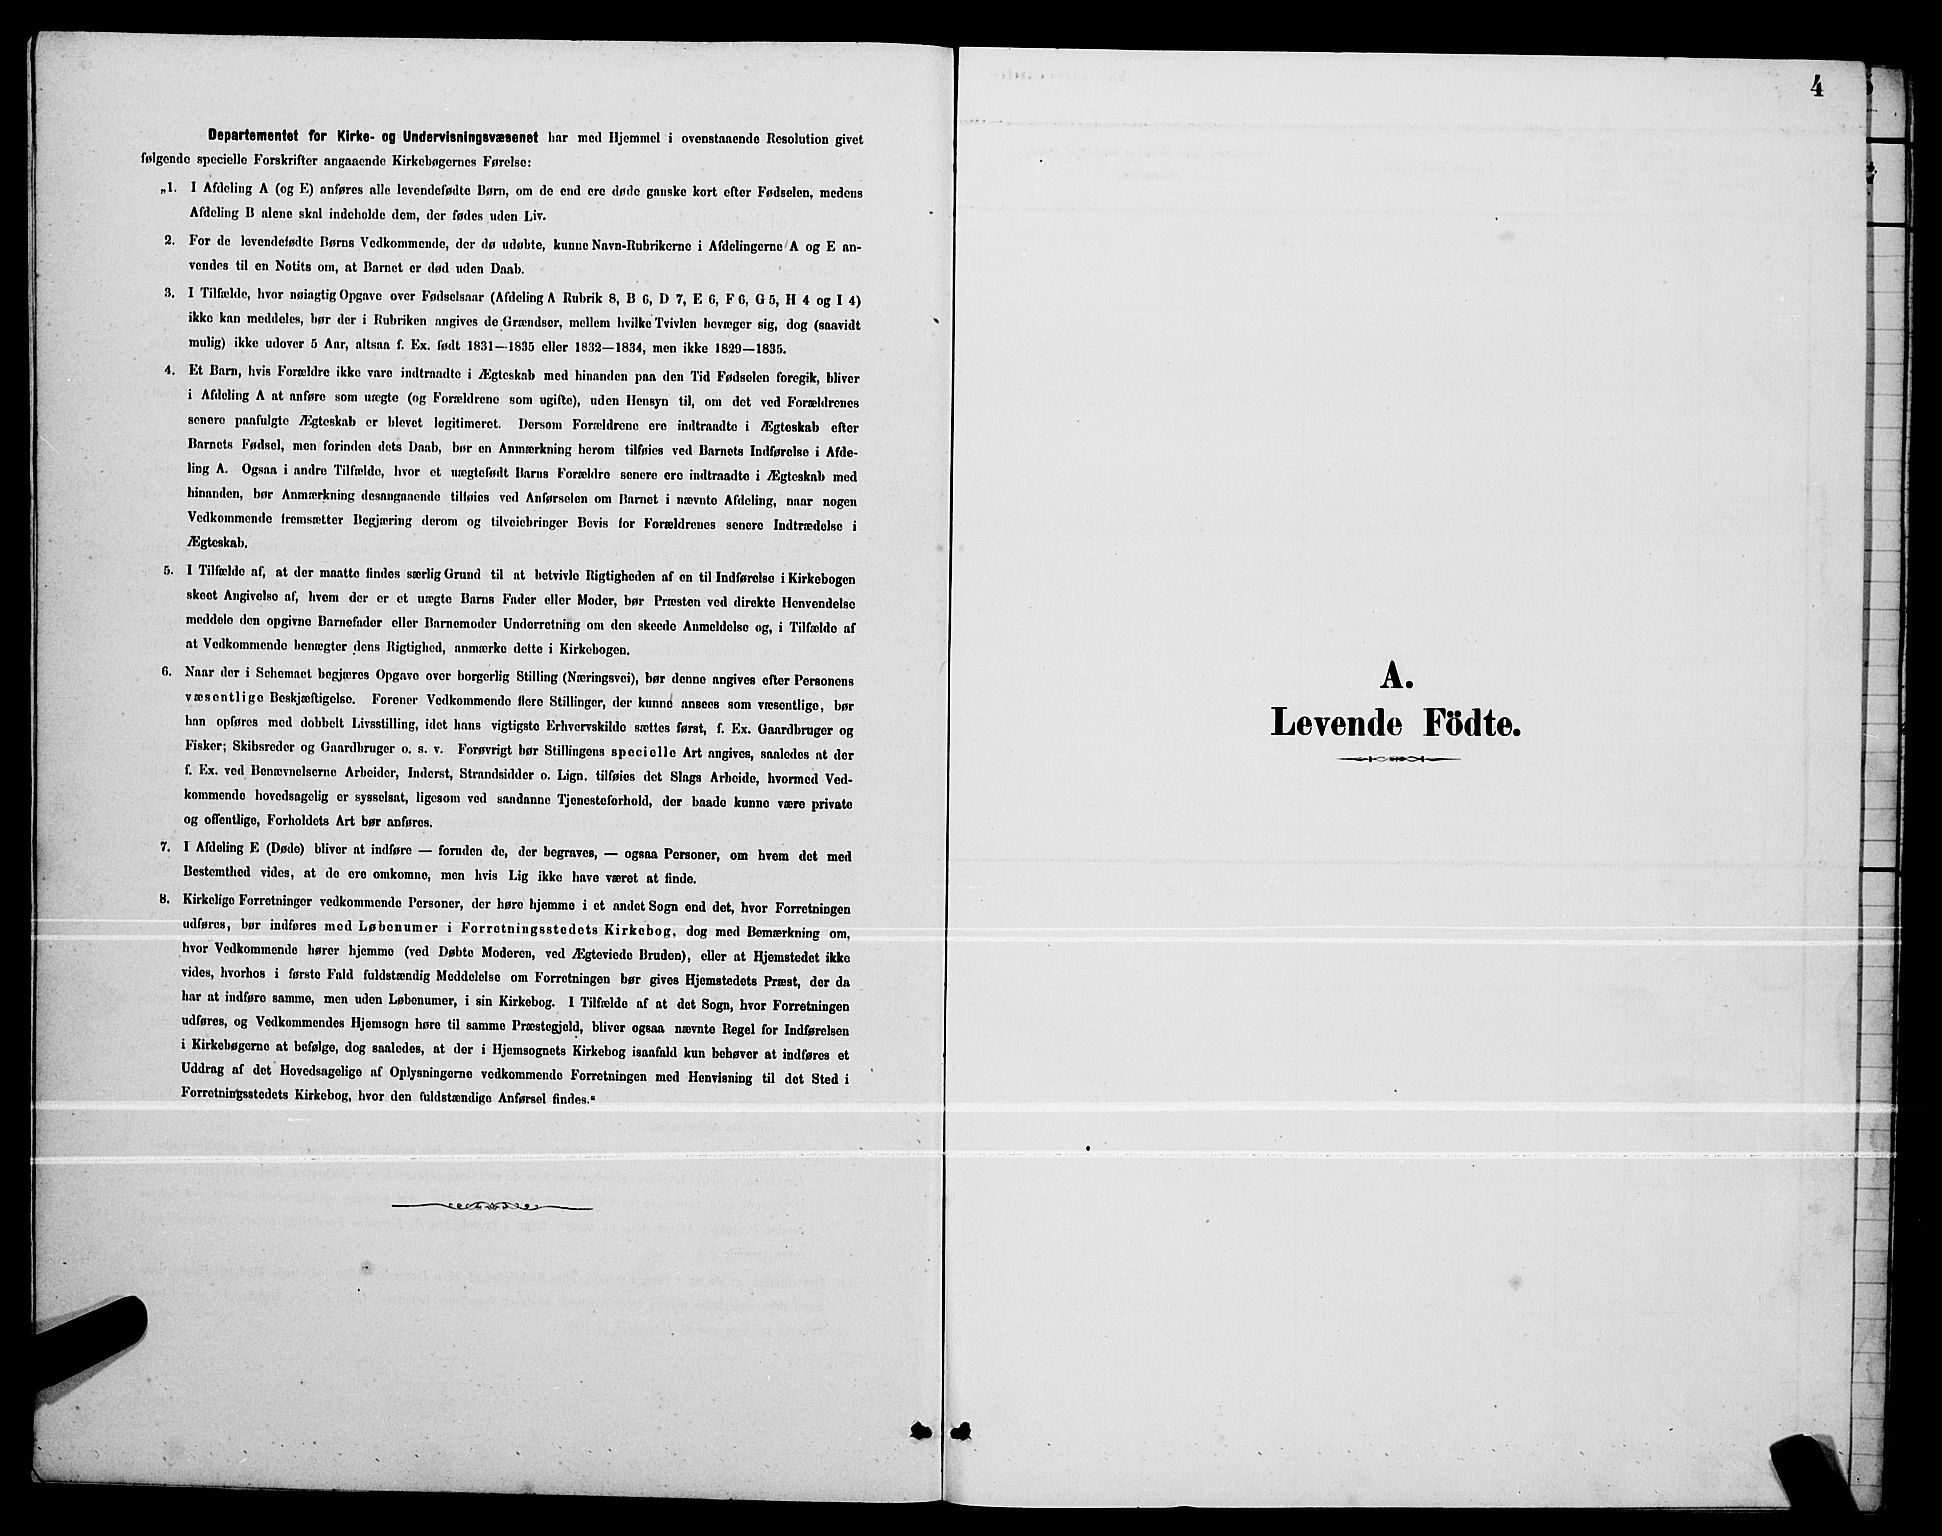 SAT, Ministerialprotokoller, klokkerbøker og fødselsregistre - Nordland, 803/L0076: Klokkerbok nr. 803C03, 1882-1897, s. 4